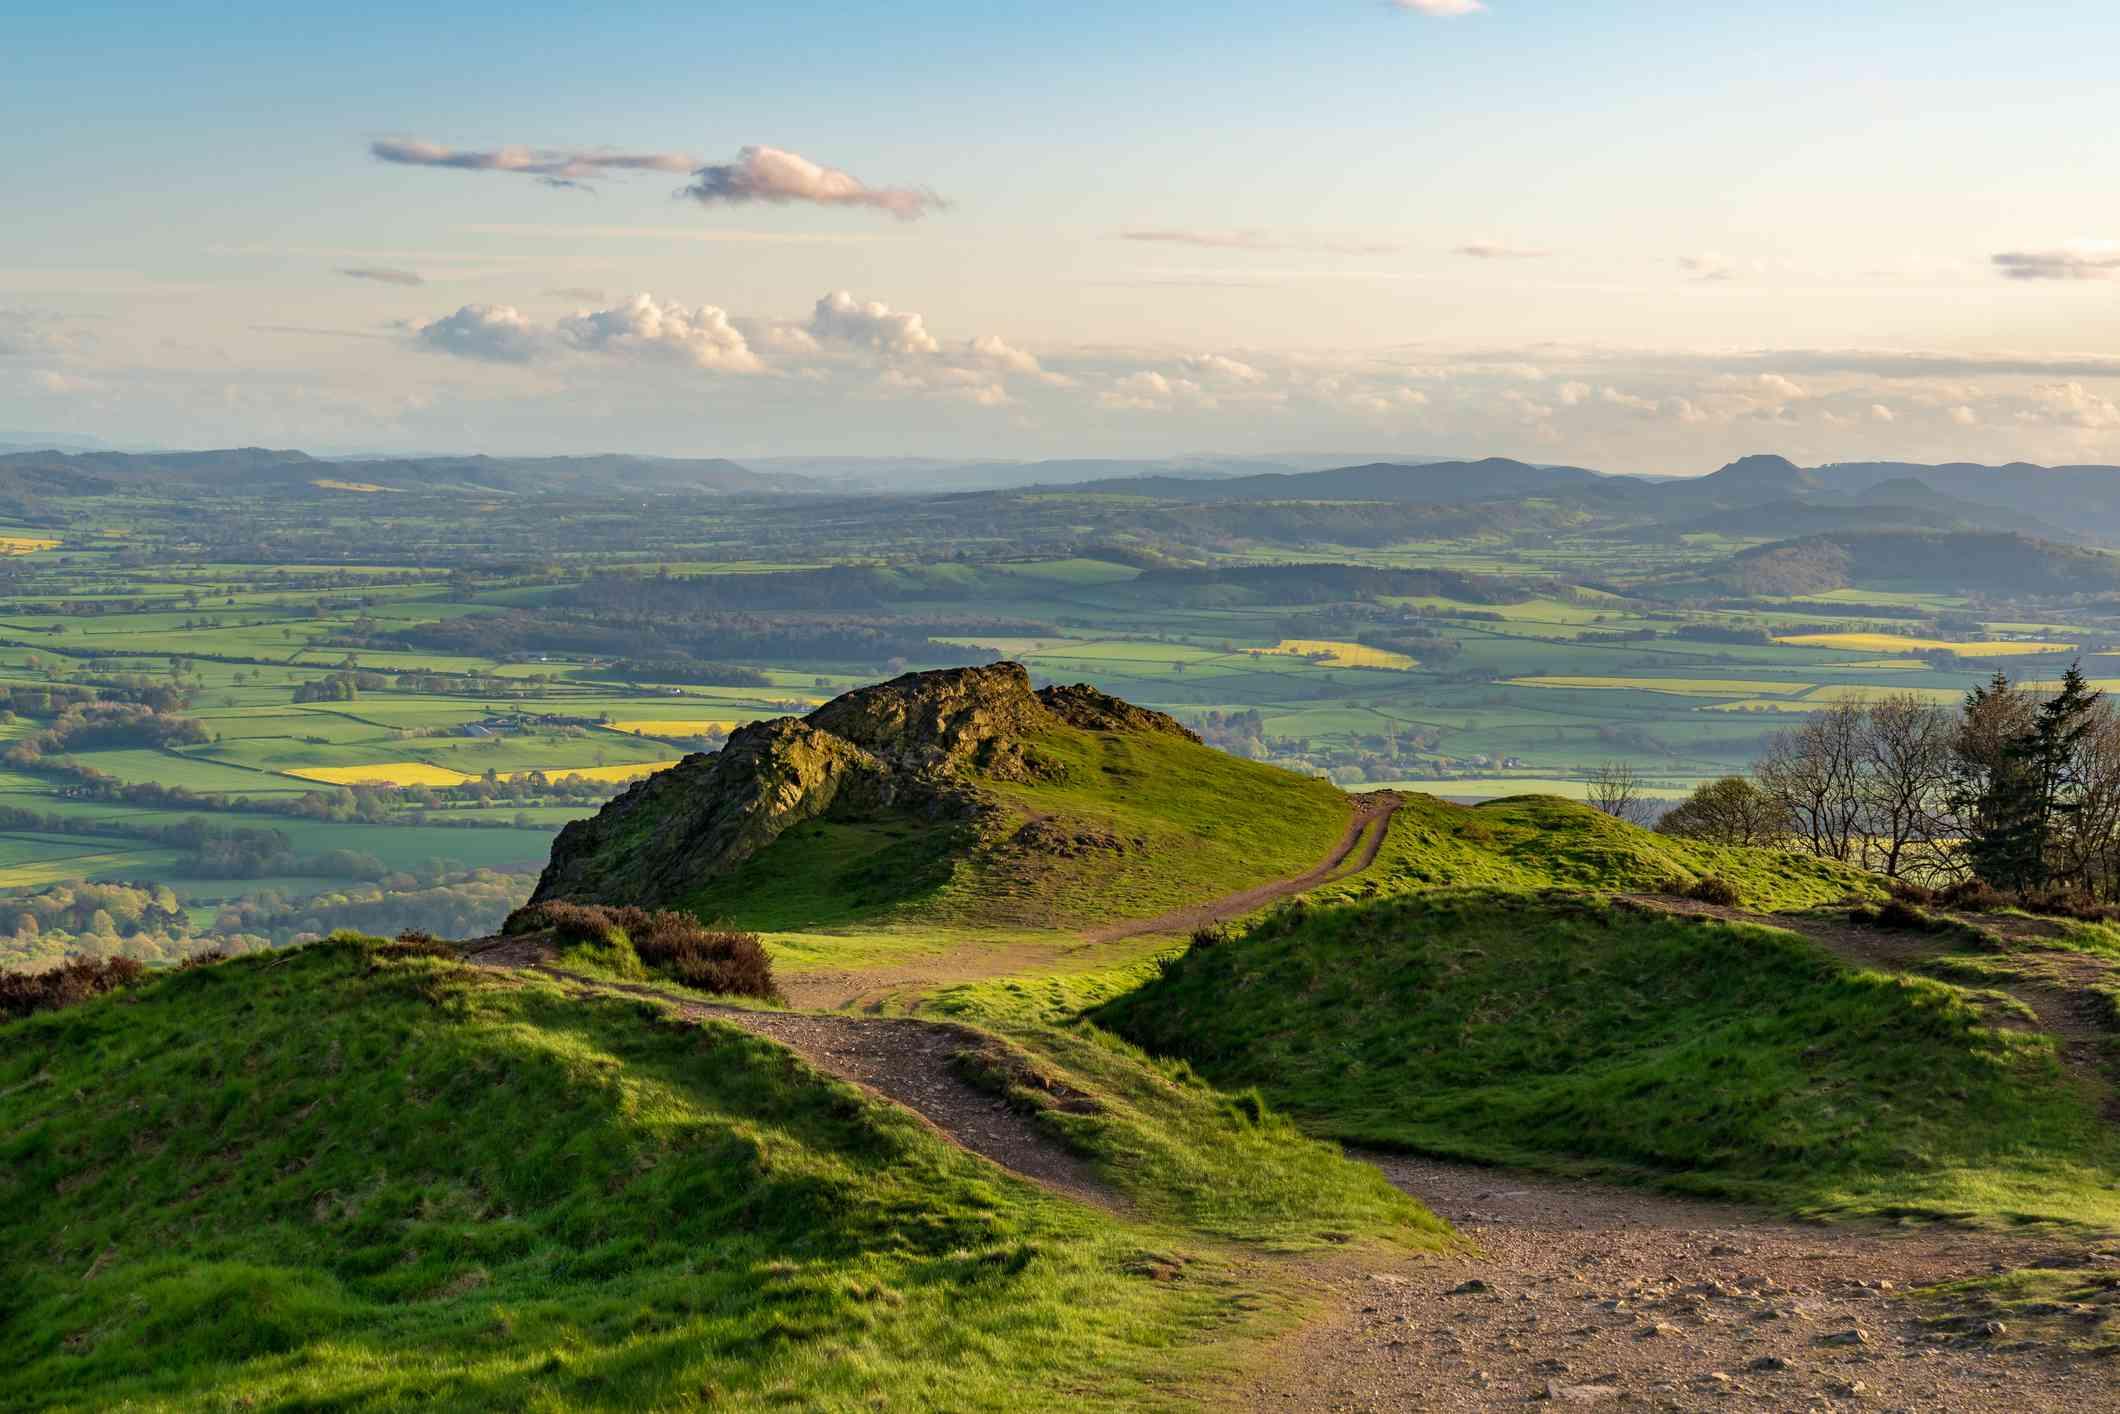 View from the Wrekin, Shropshire, England